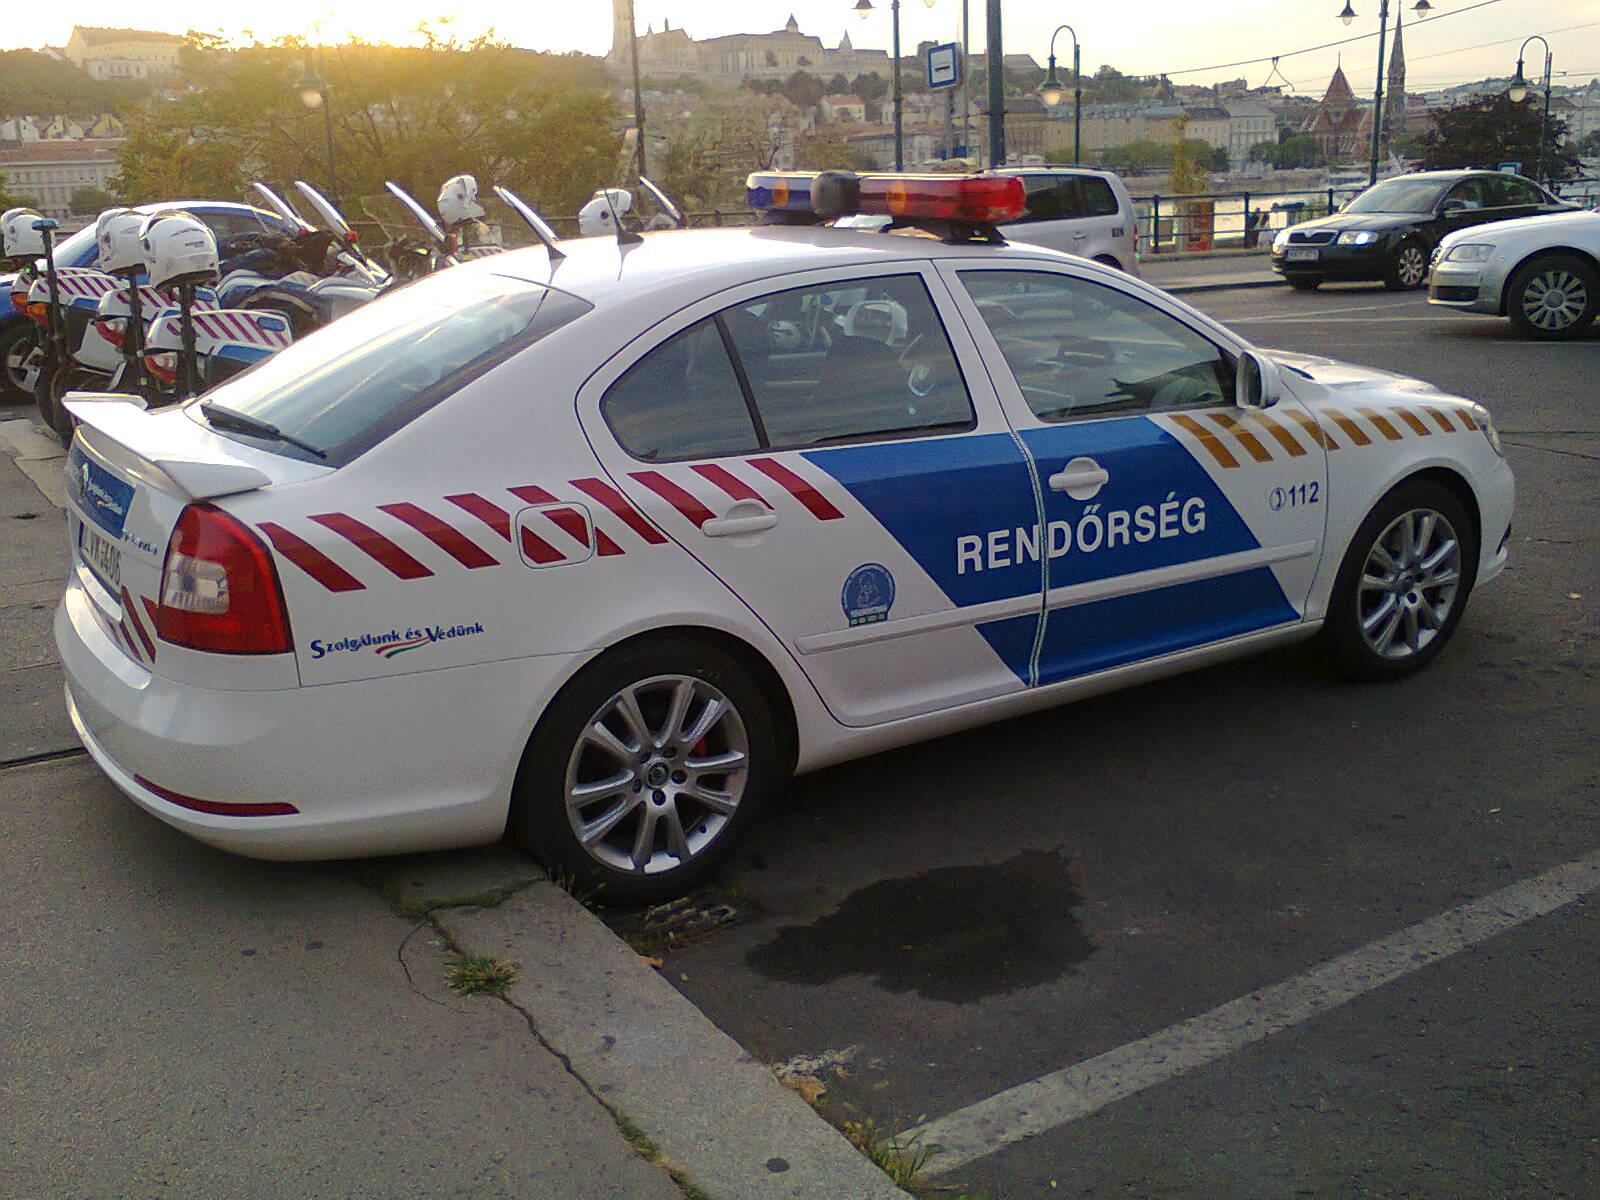 Skoda au service de la police - Page 2 Skoda_police_car_HU